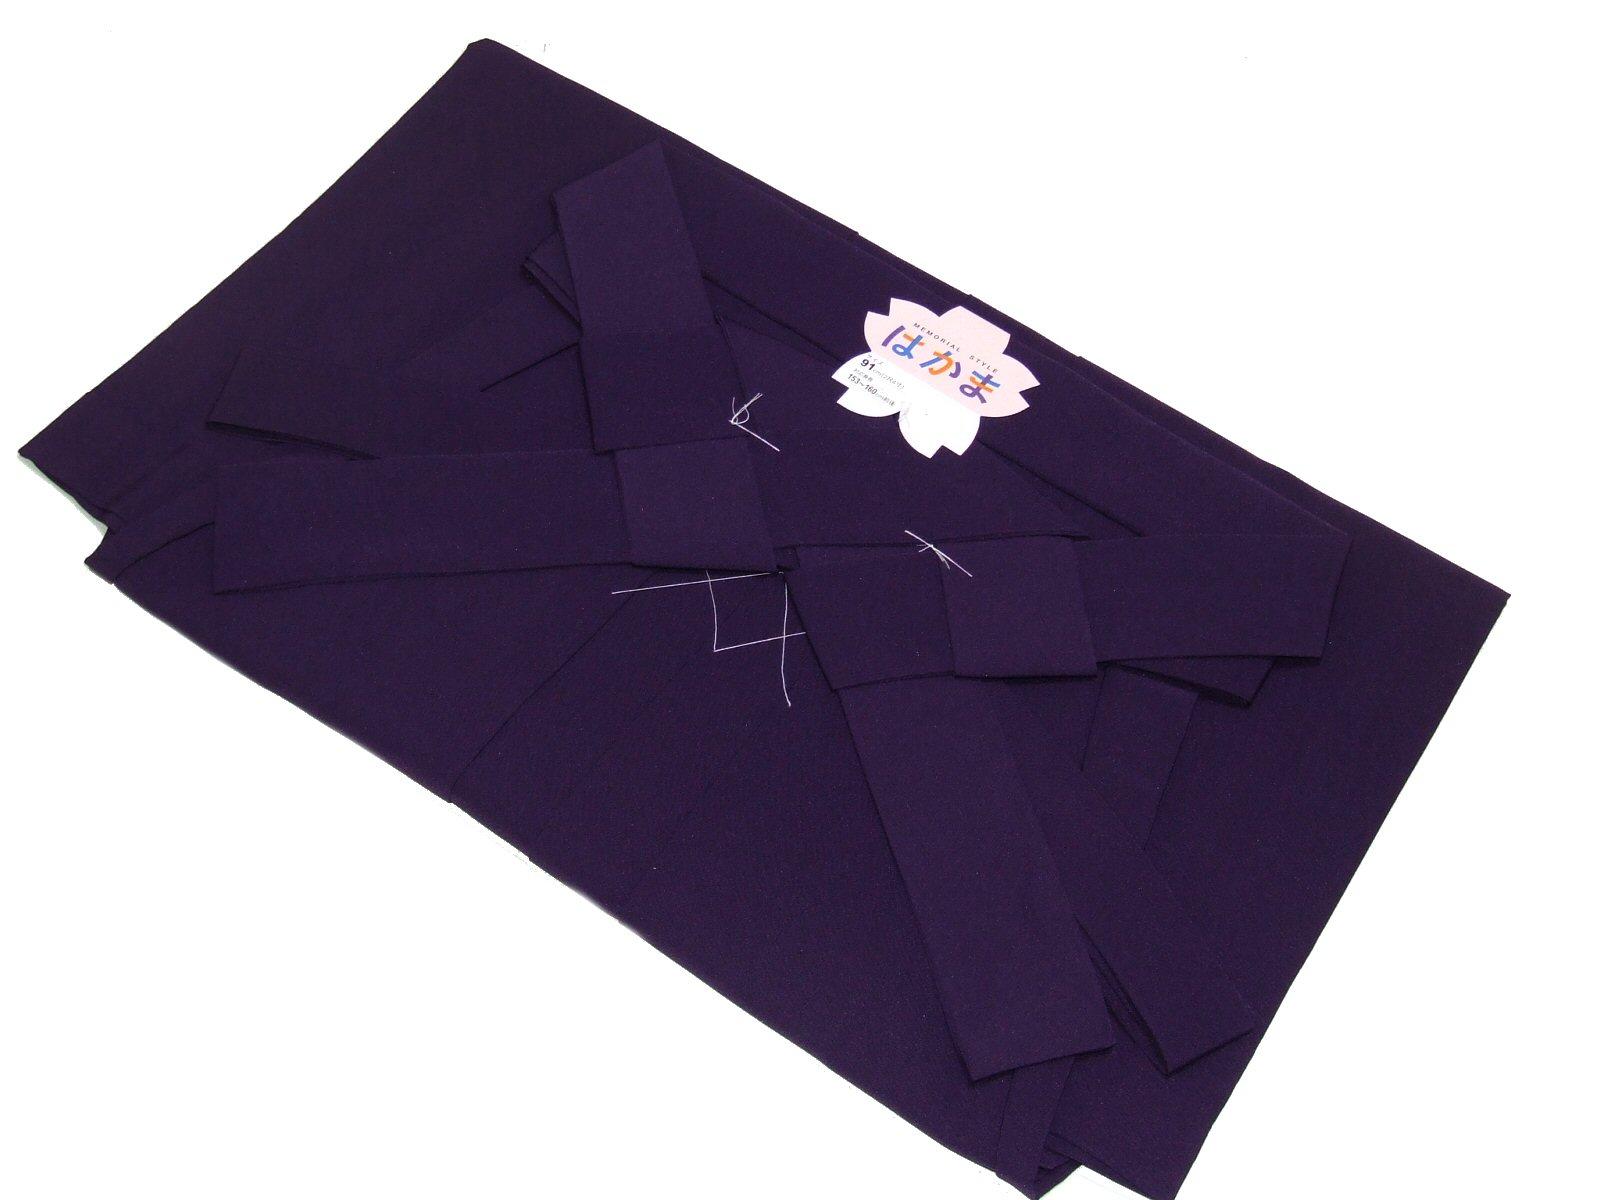 女性用無地袴(卒業式)No.004-a(紫色)-Lサイズ-95